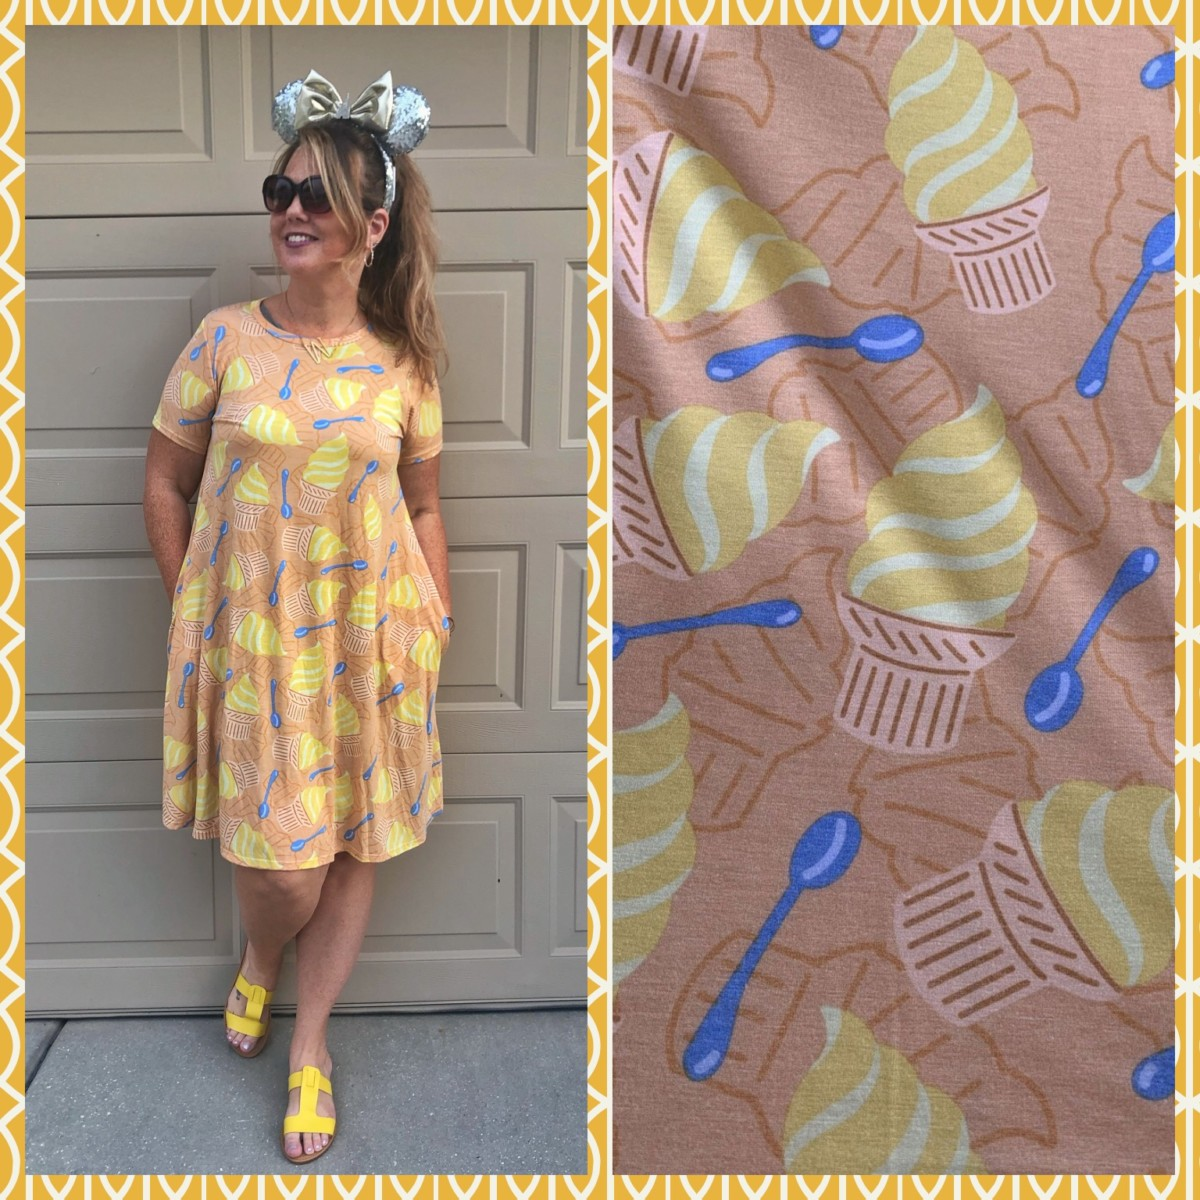 NEW Disney Style! Magically Themed Dresses & Leggings! 3